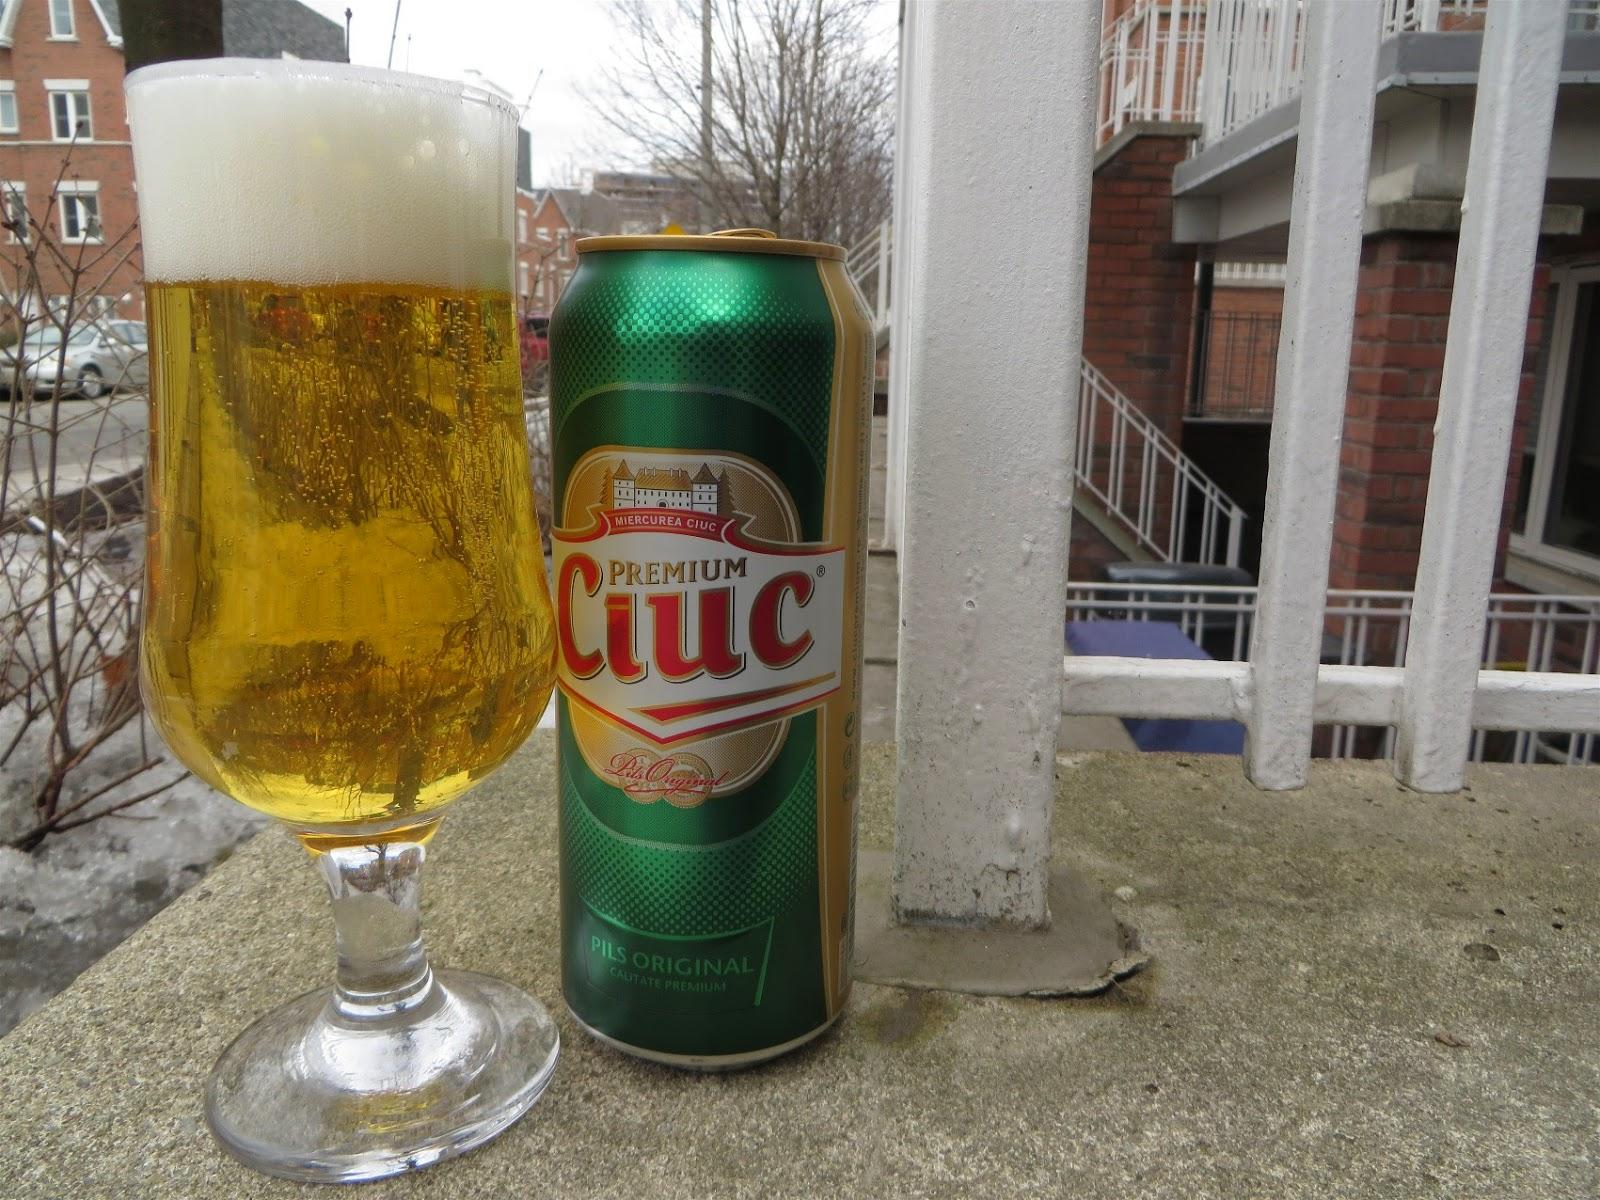 The World Of Gord Beer Of The Week Ciuc Premium Pilsner